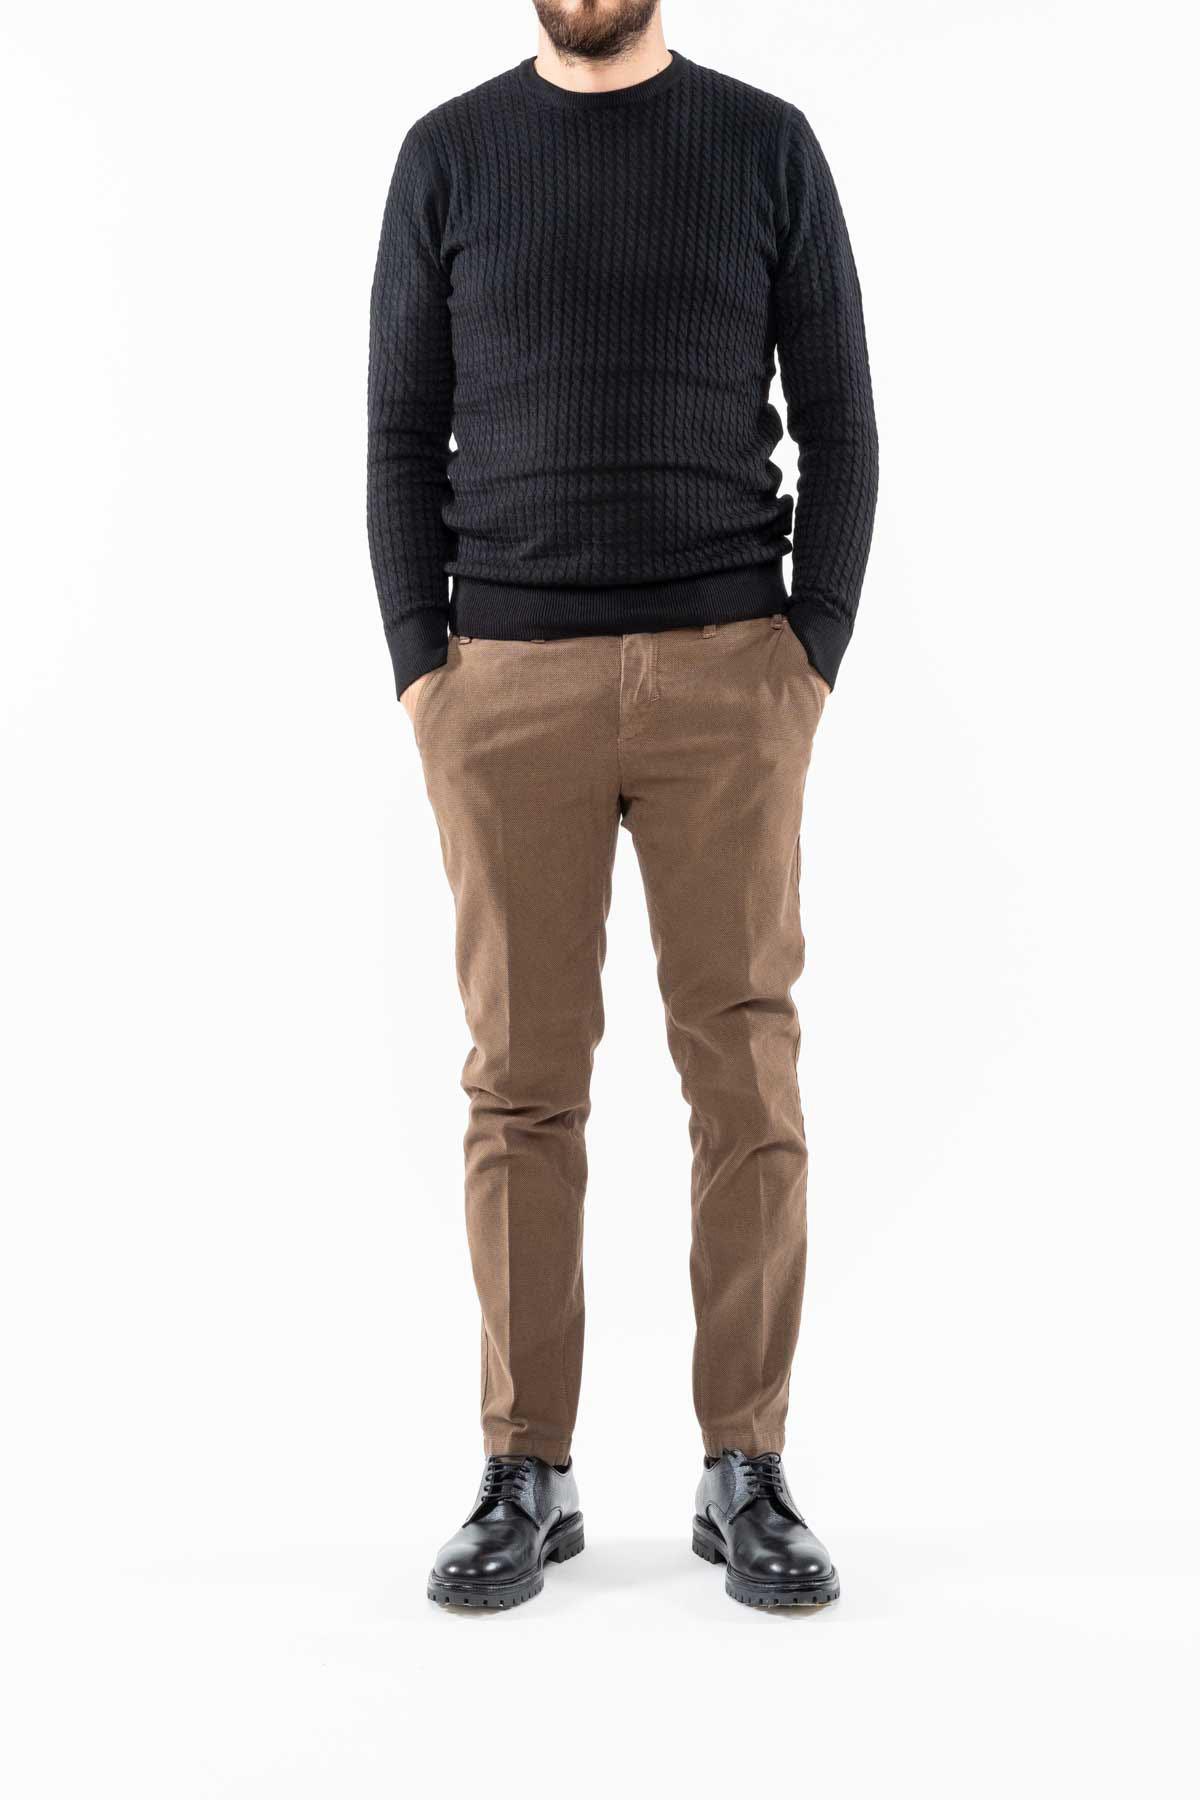 pantalone,beige